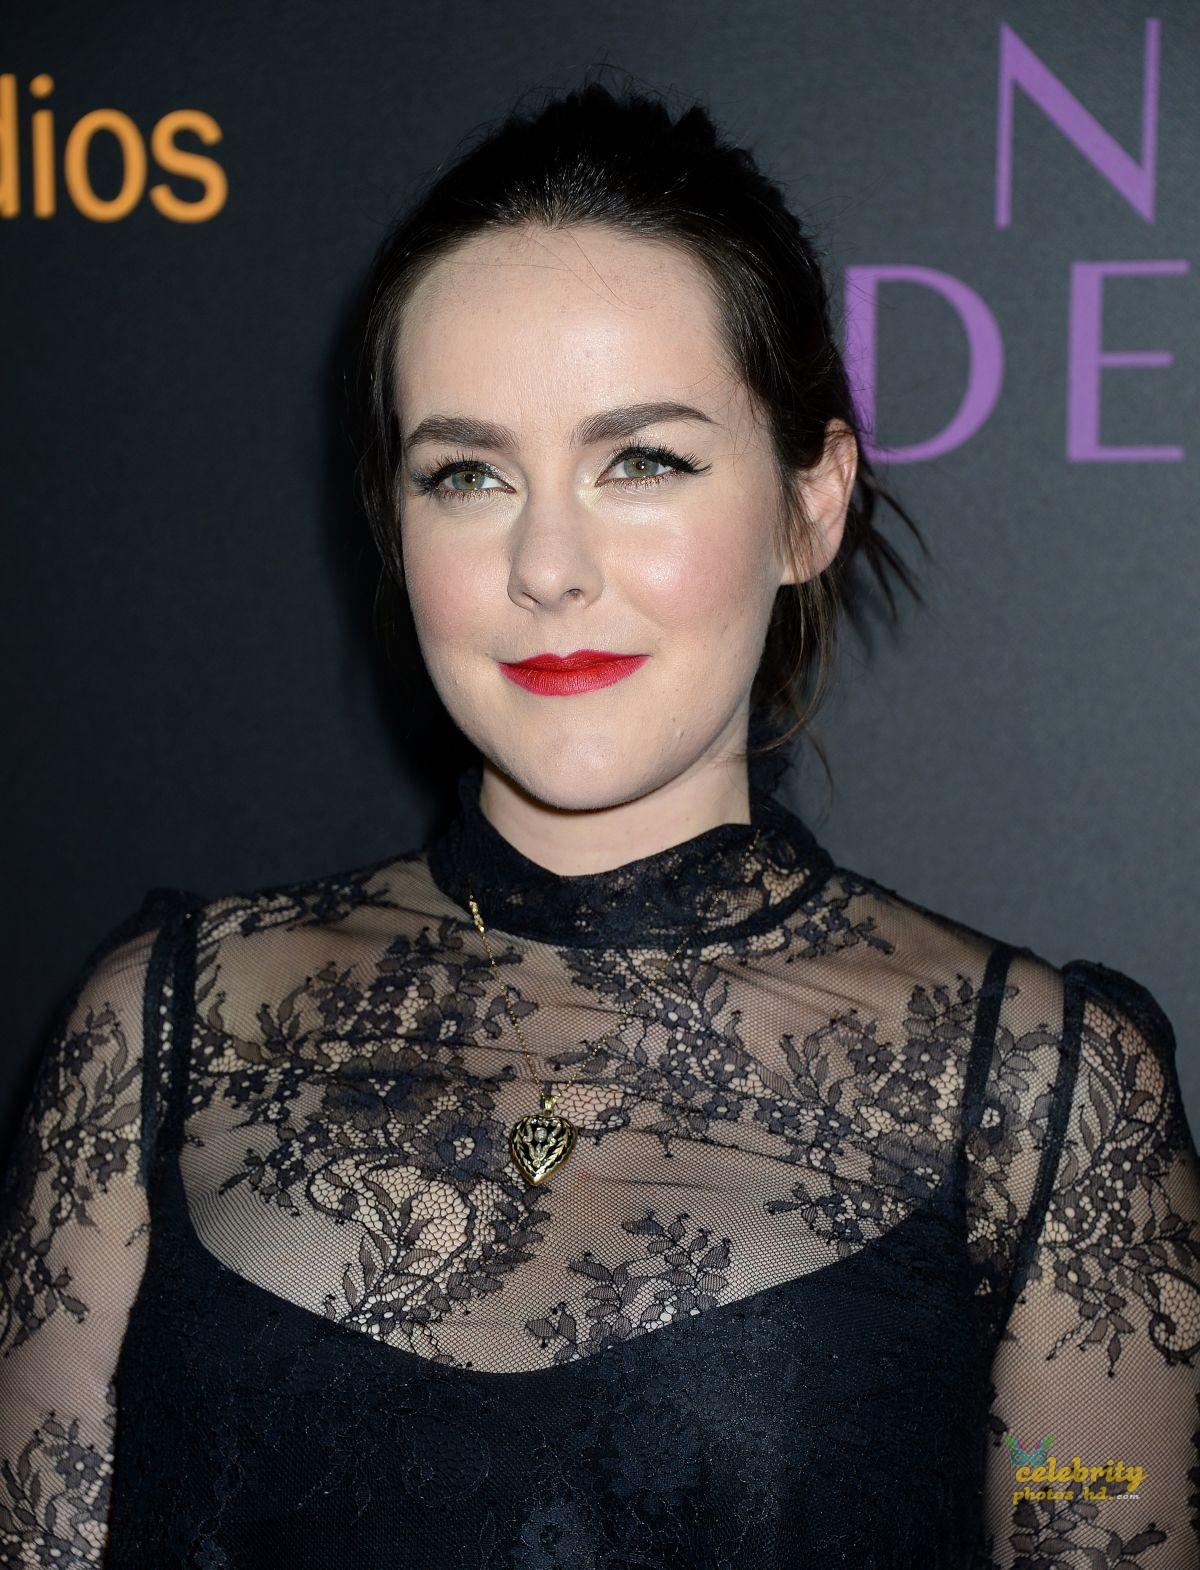 JENA MALONE at 'The Neon Demon' Premiere in Los Angeles (3)